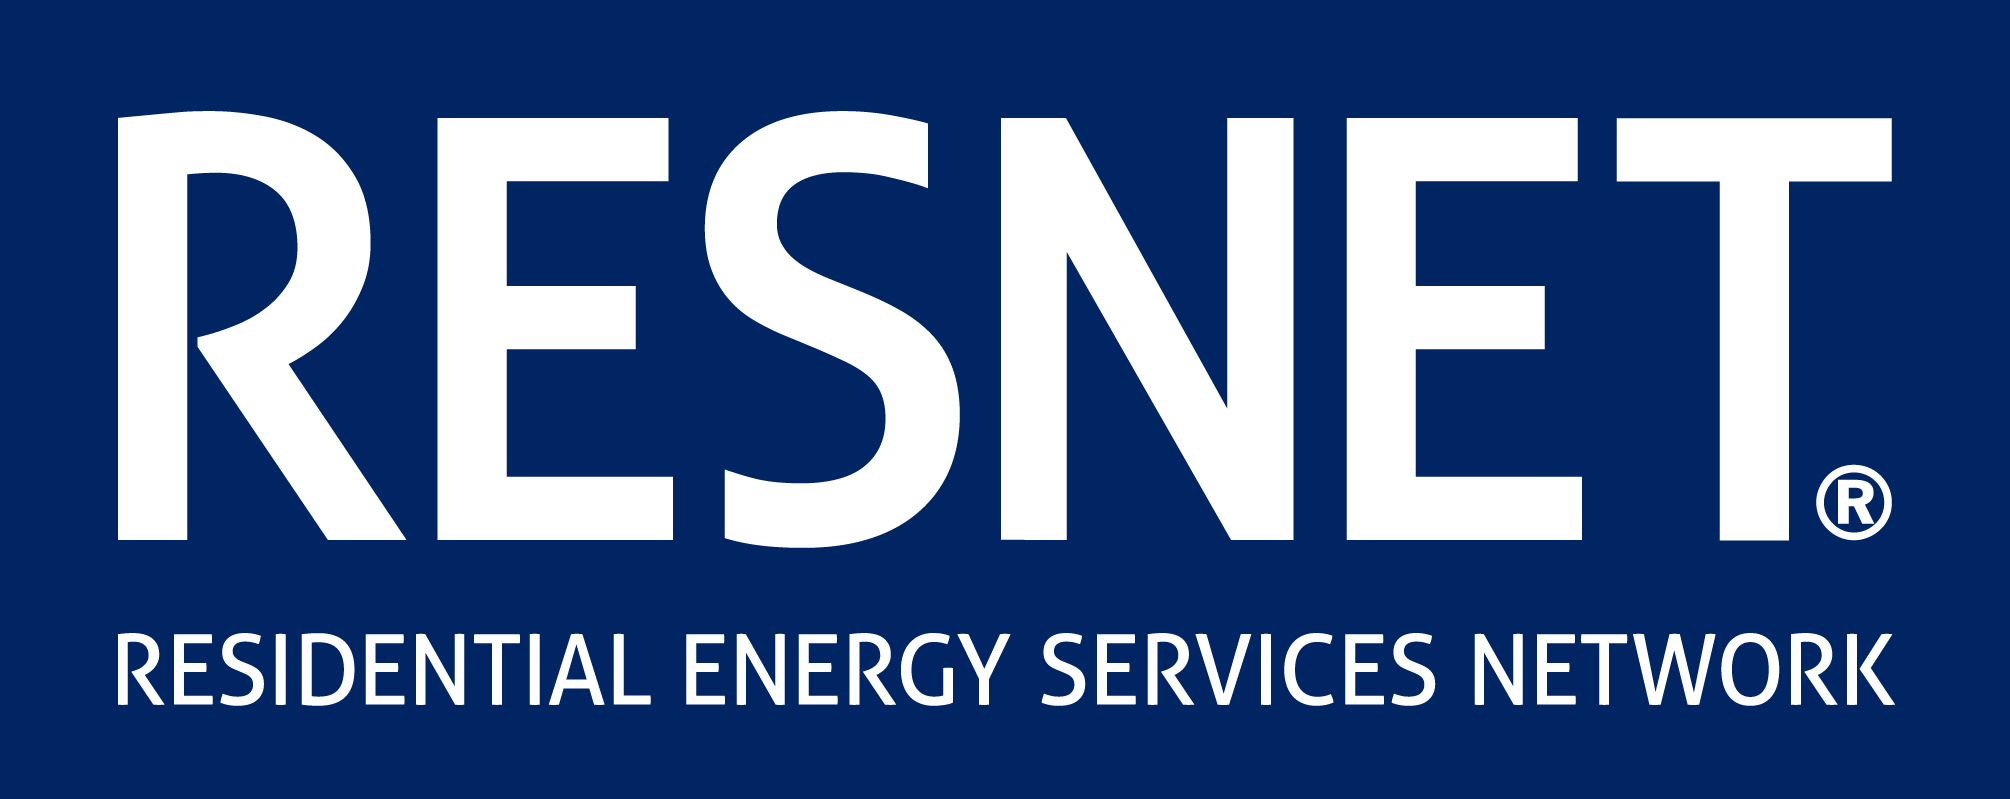 RESNET_Logo_RGB_Web_Use